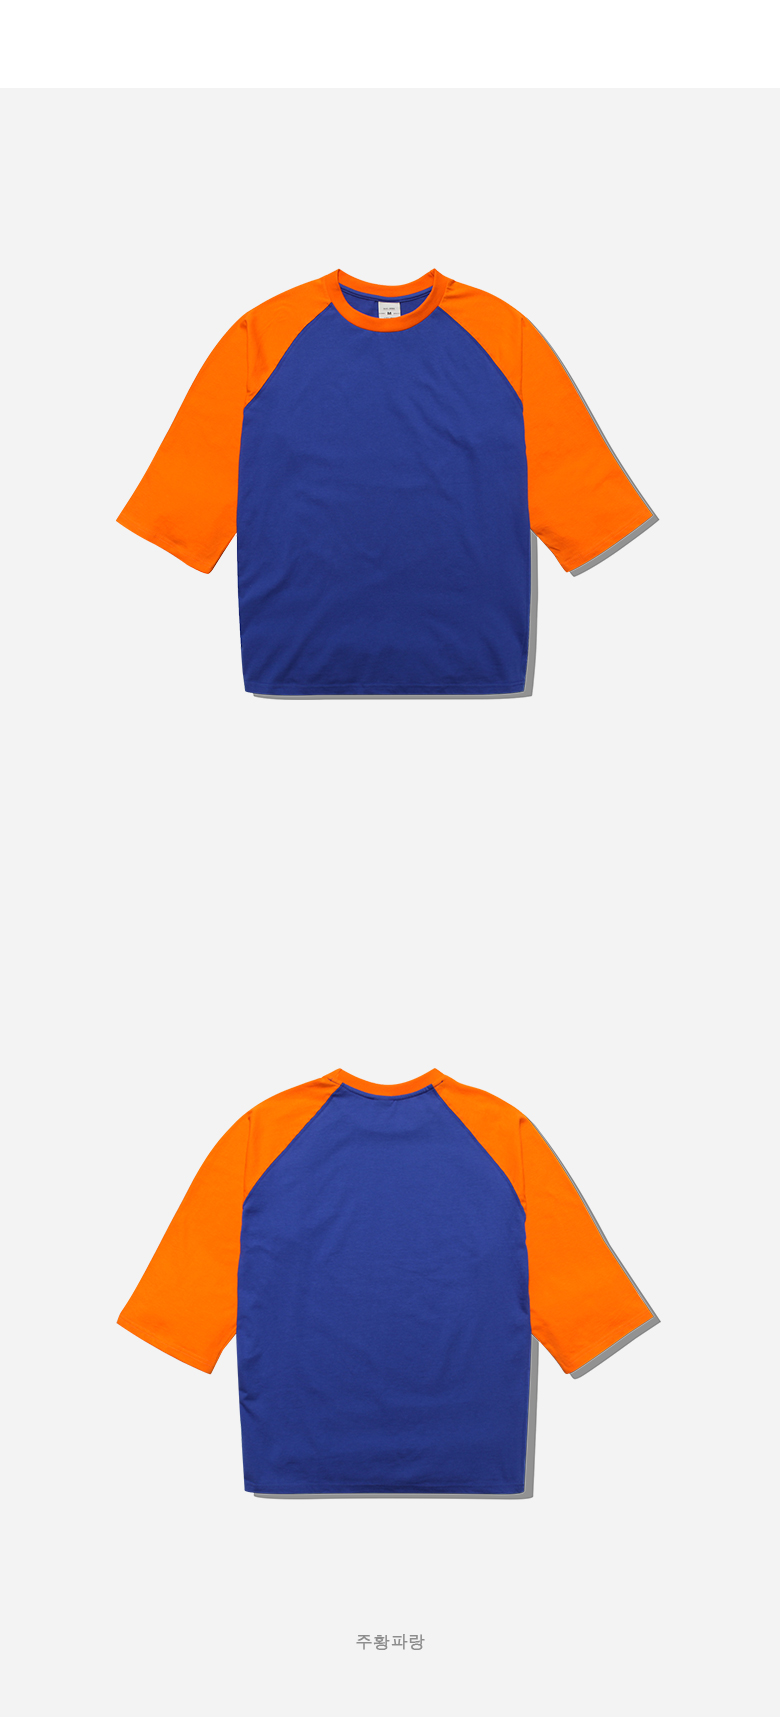 20190221_fp_JHLT1169_orangeblue_detail_01.jpg